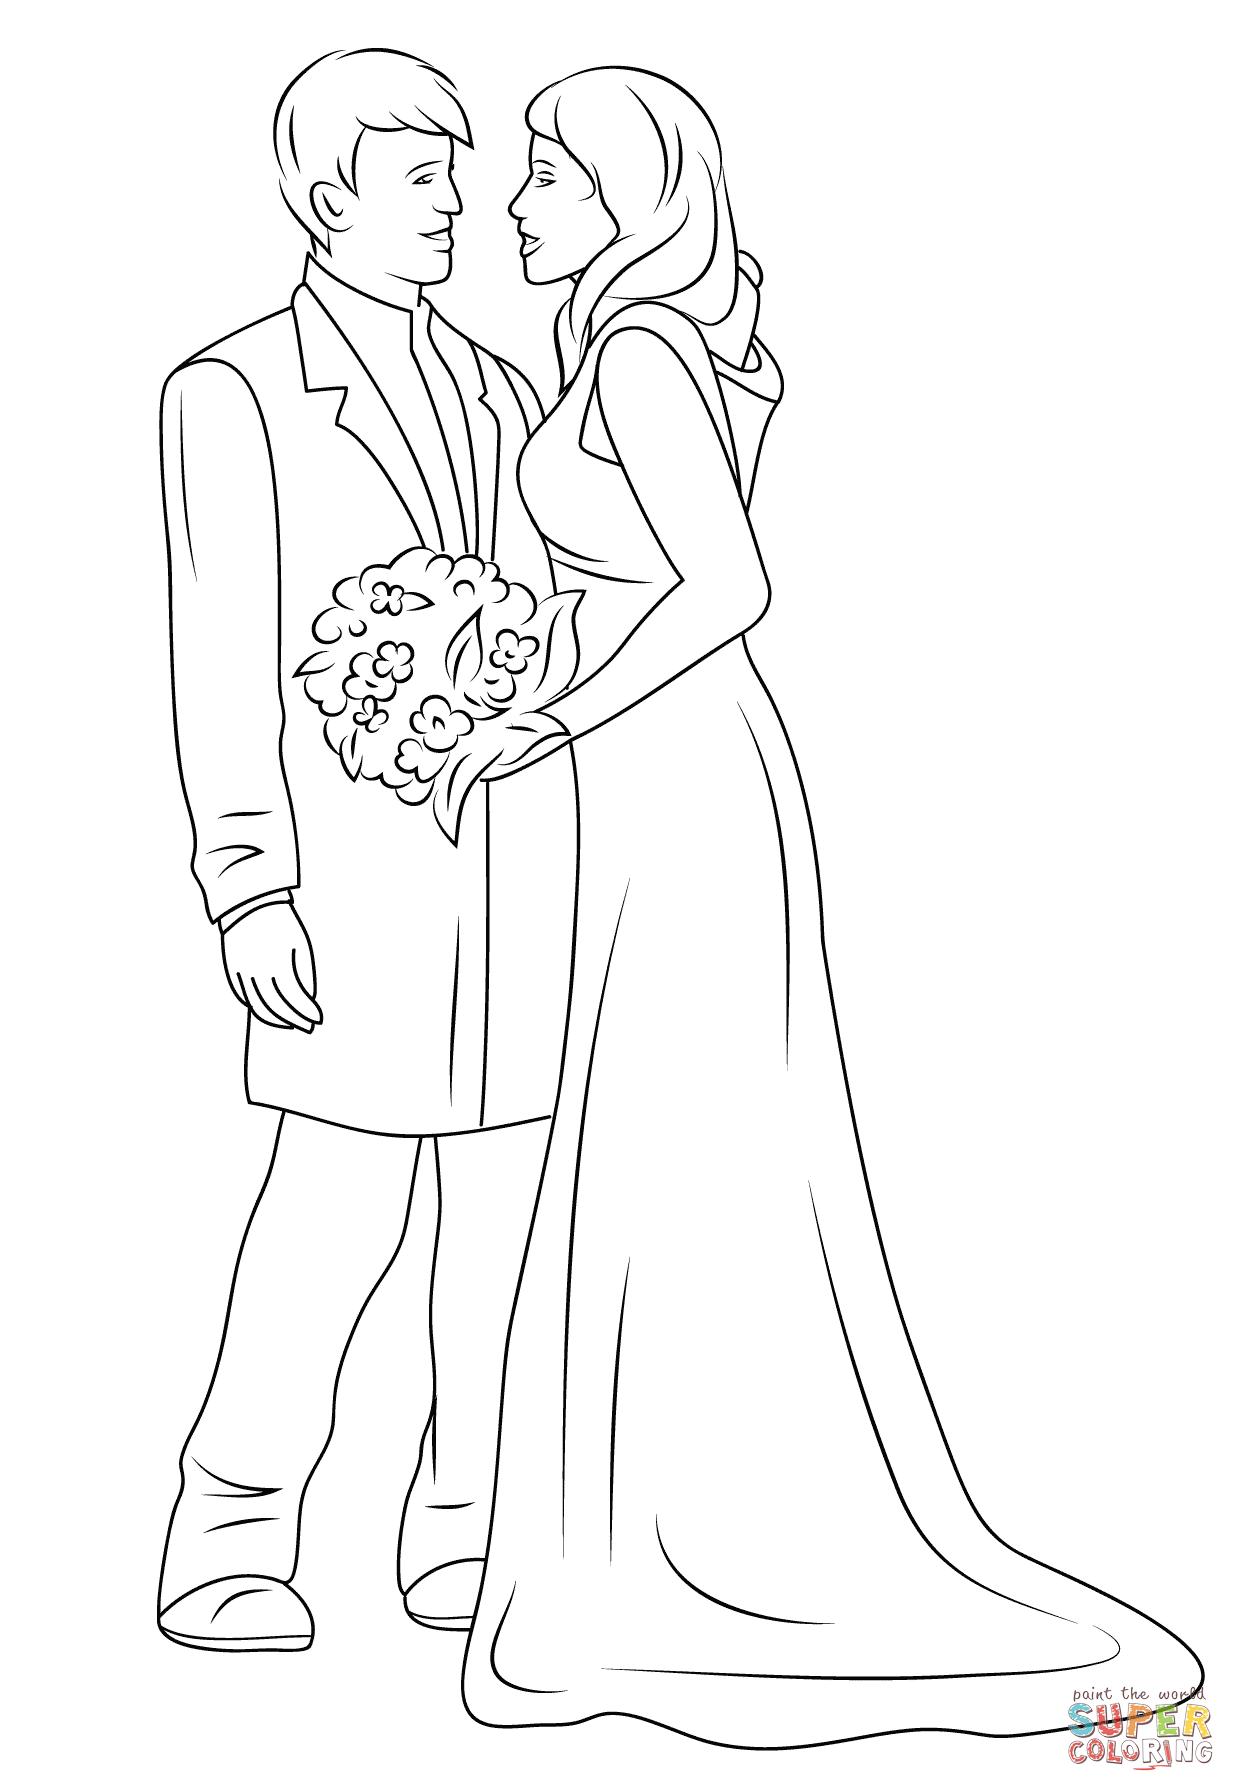 Wedding Couple Coloring Page Free Printable Coloring Pages Wedding Coloring Pages Love Coloring Pages Cinderella Coloring Pages